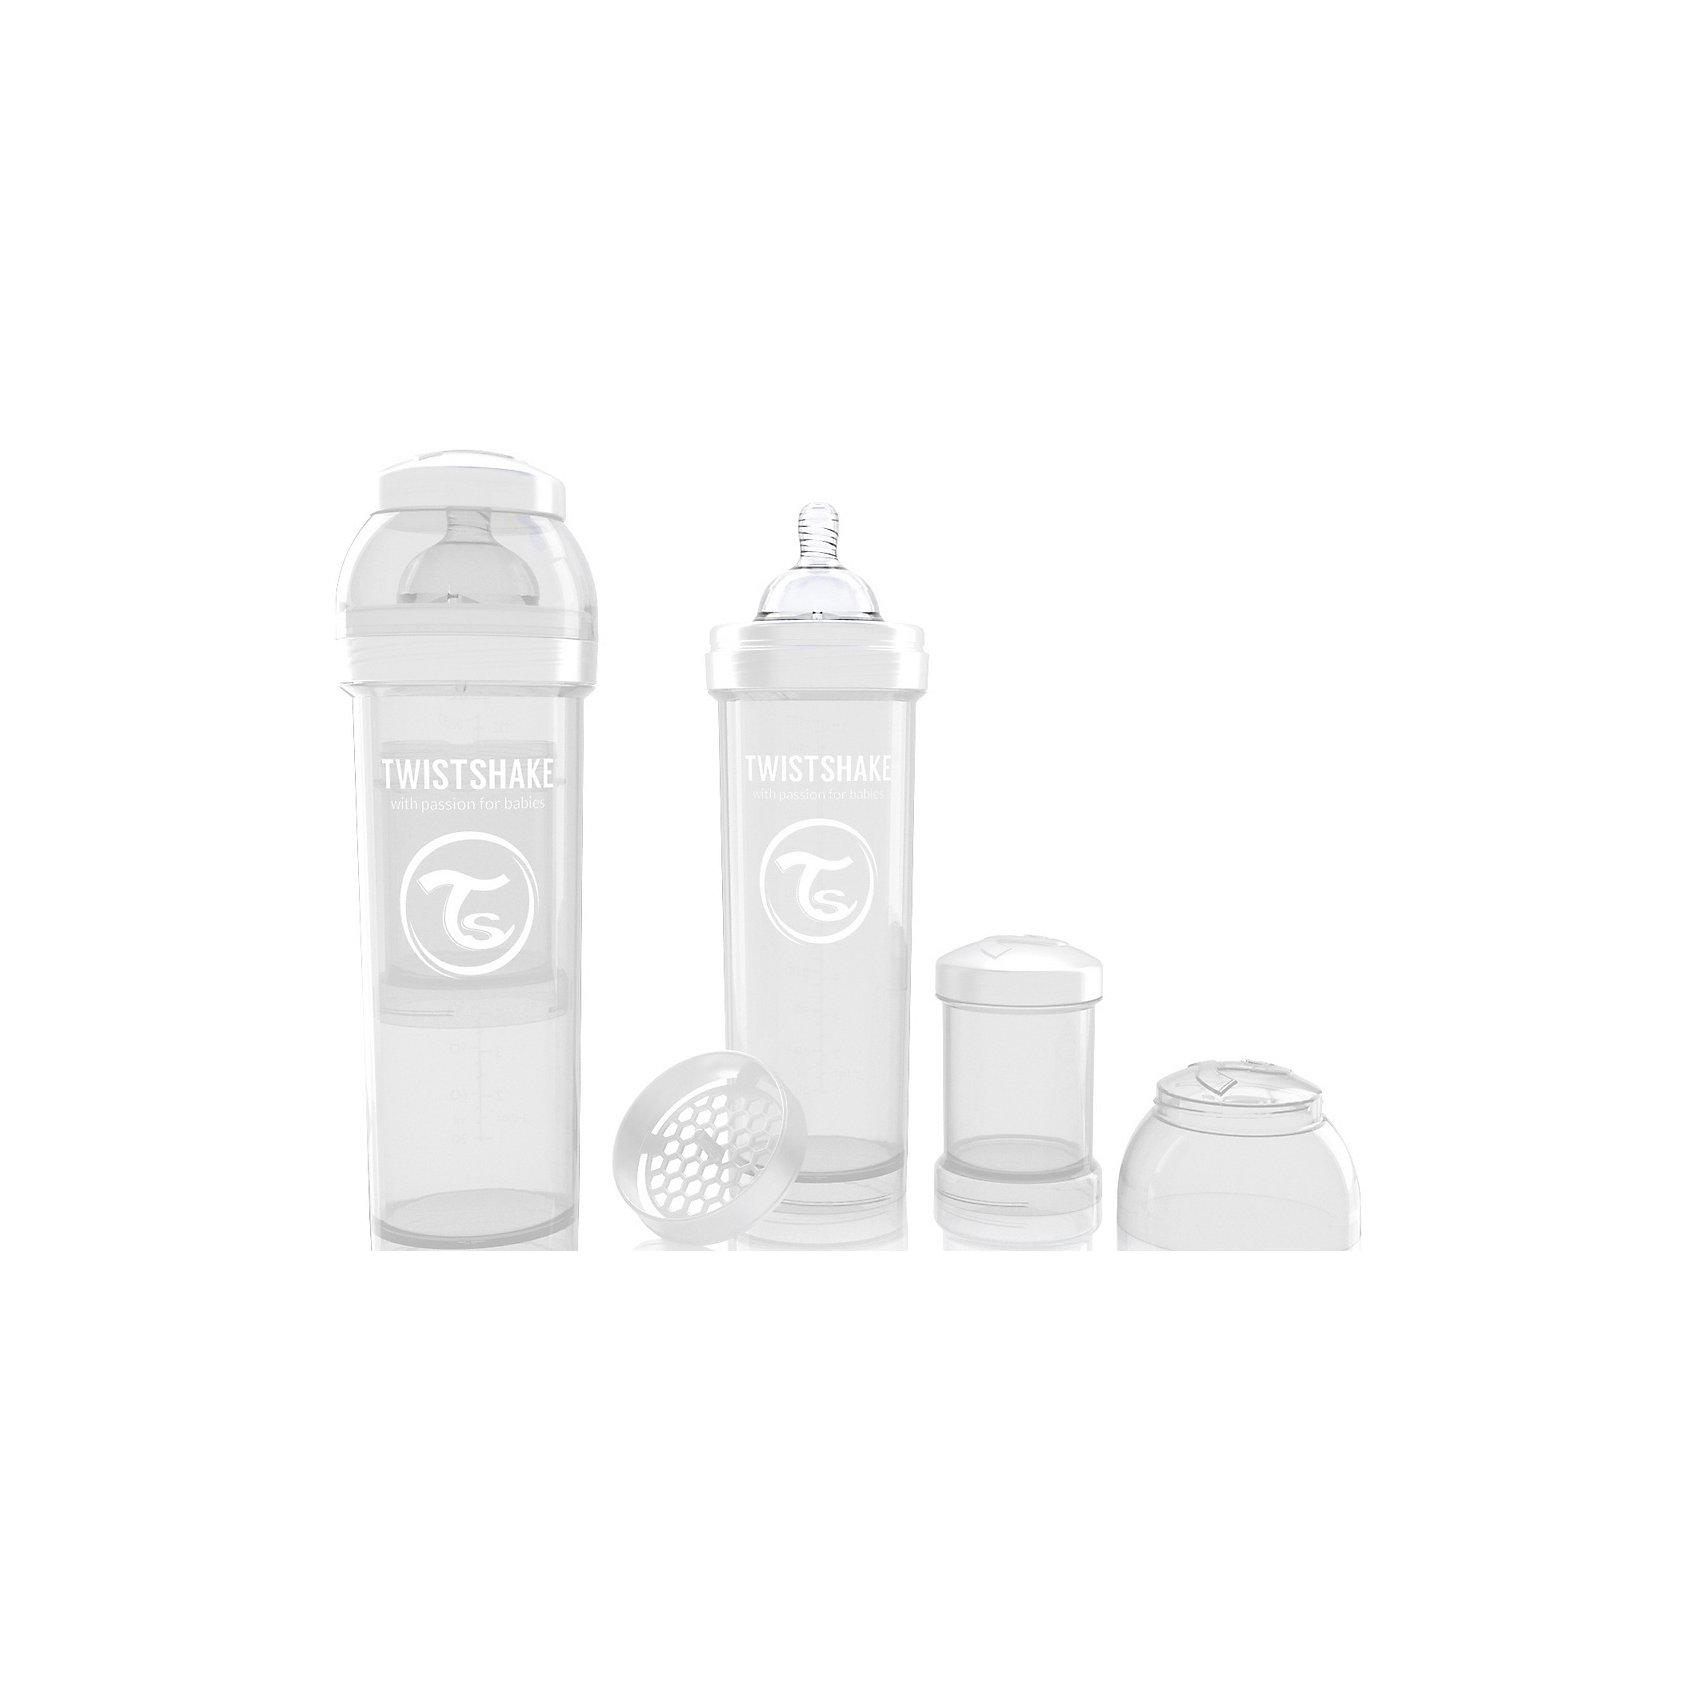 Twistshake Антиколиковая бутылочка 330 мл., Twistshake, белый шарк 330 купить в украике